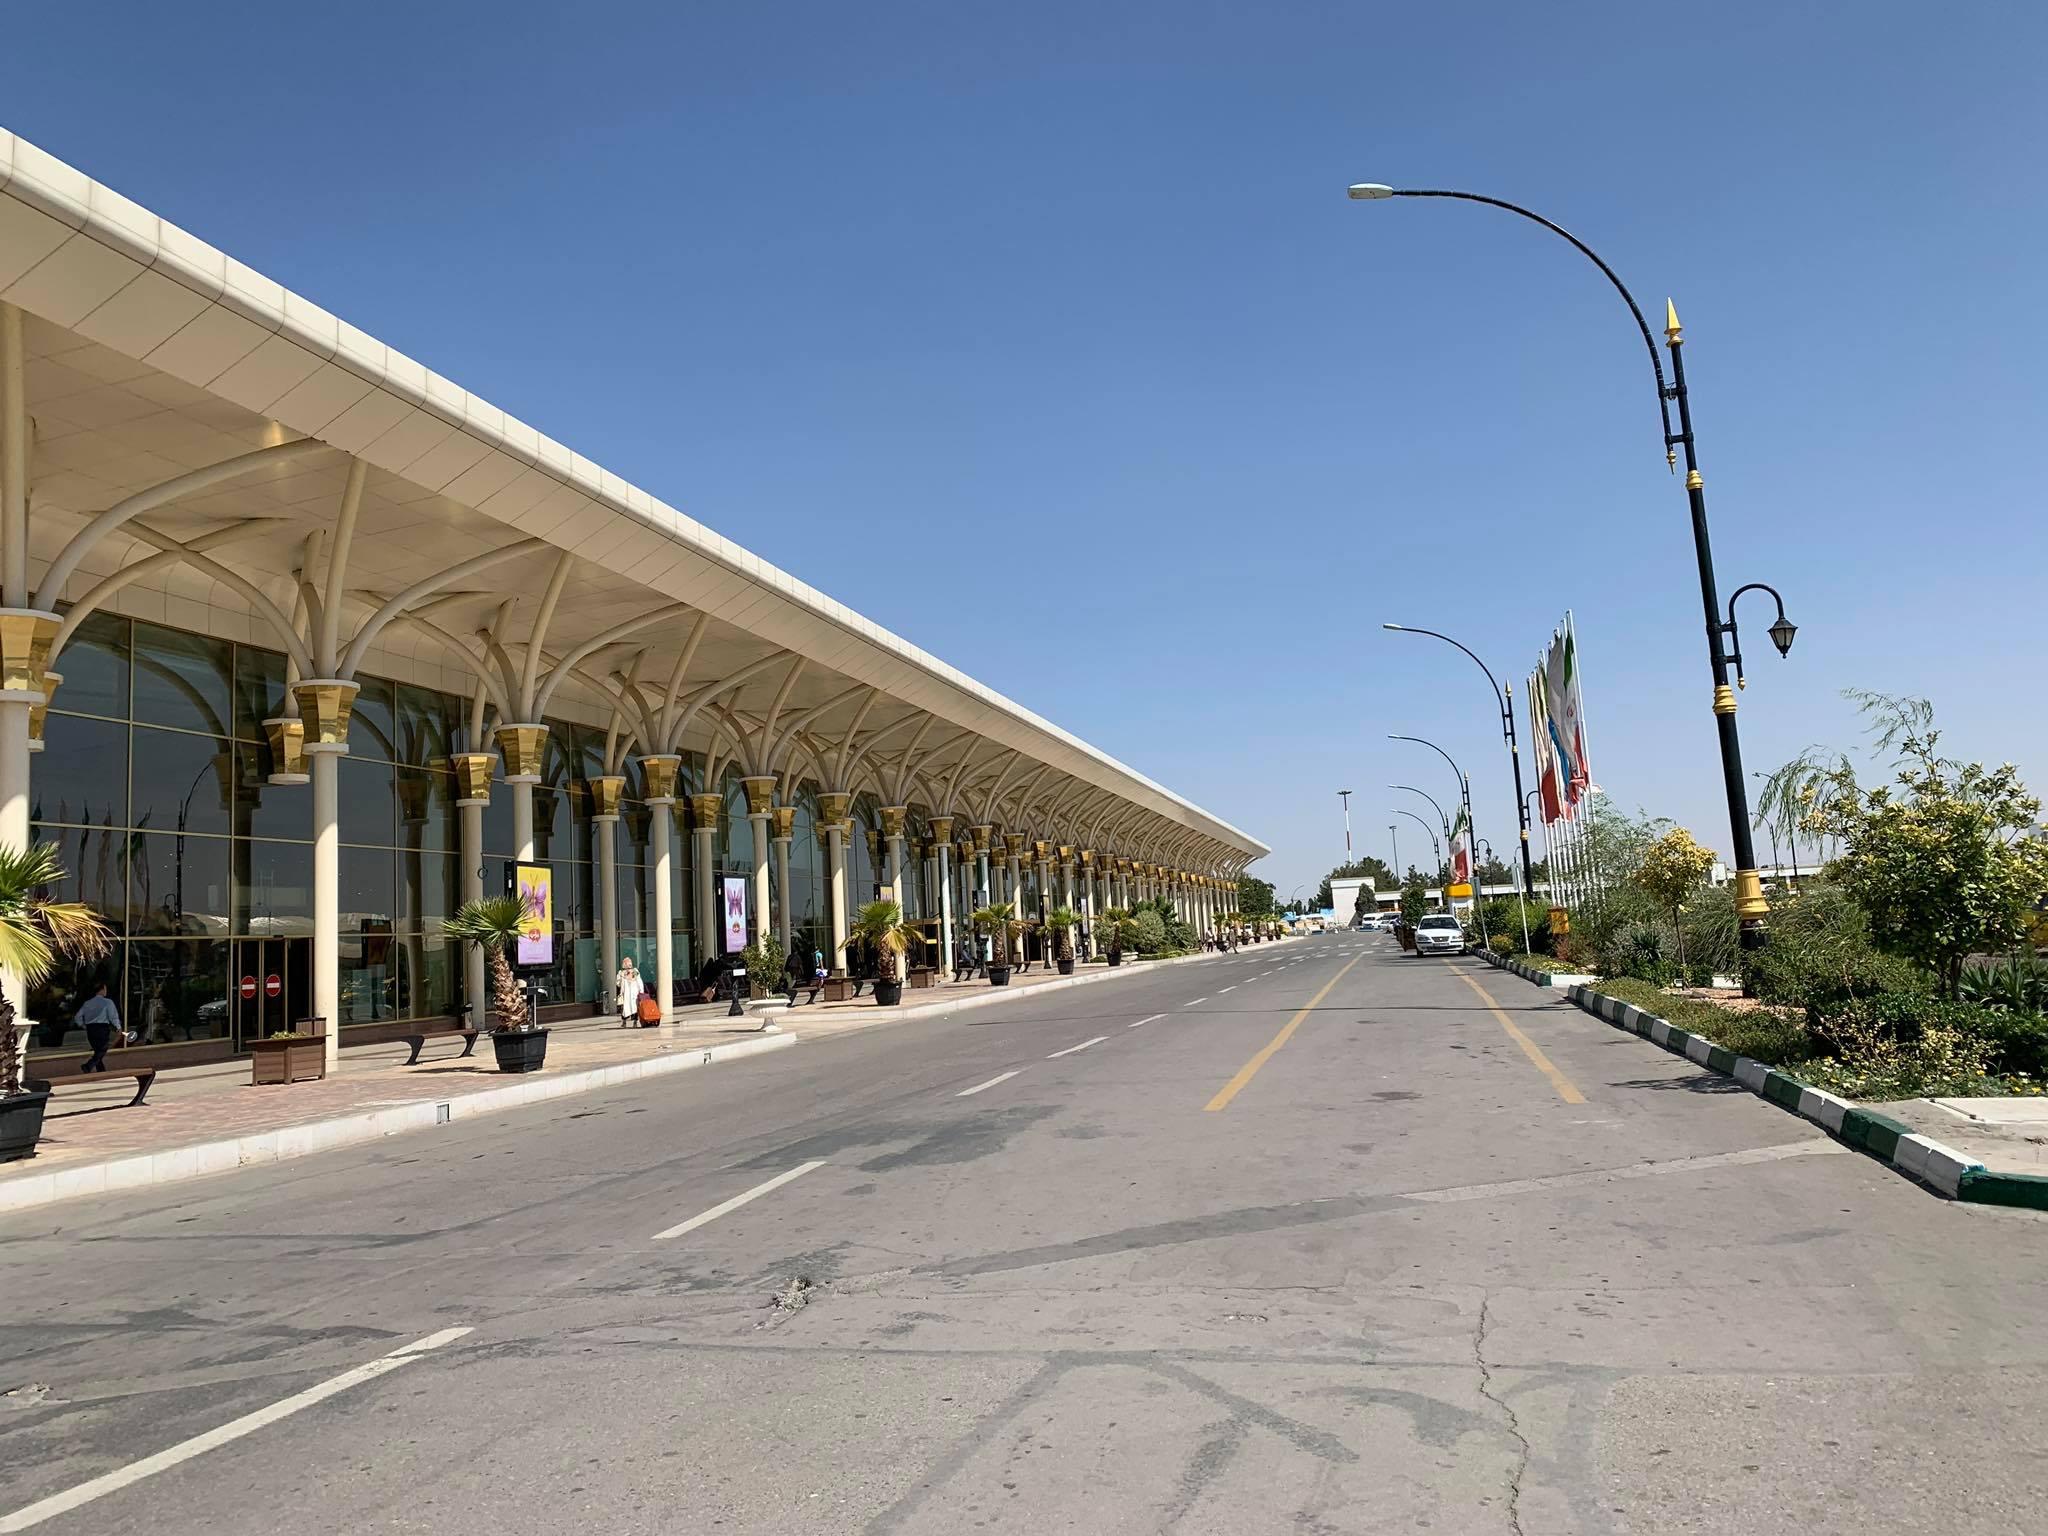 Kach Solo Travels in 2019 Mashhad to Shiraz10.jpg